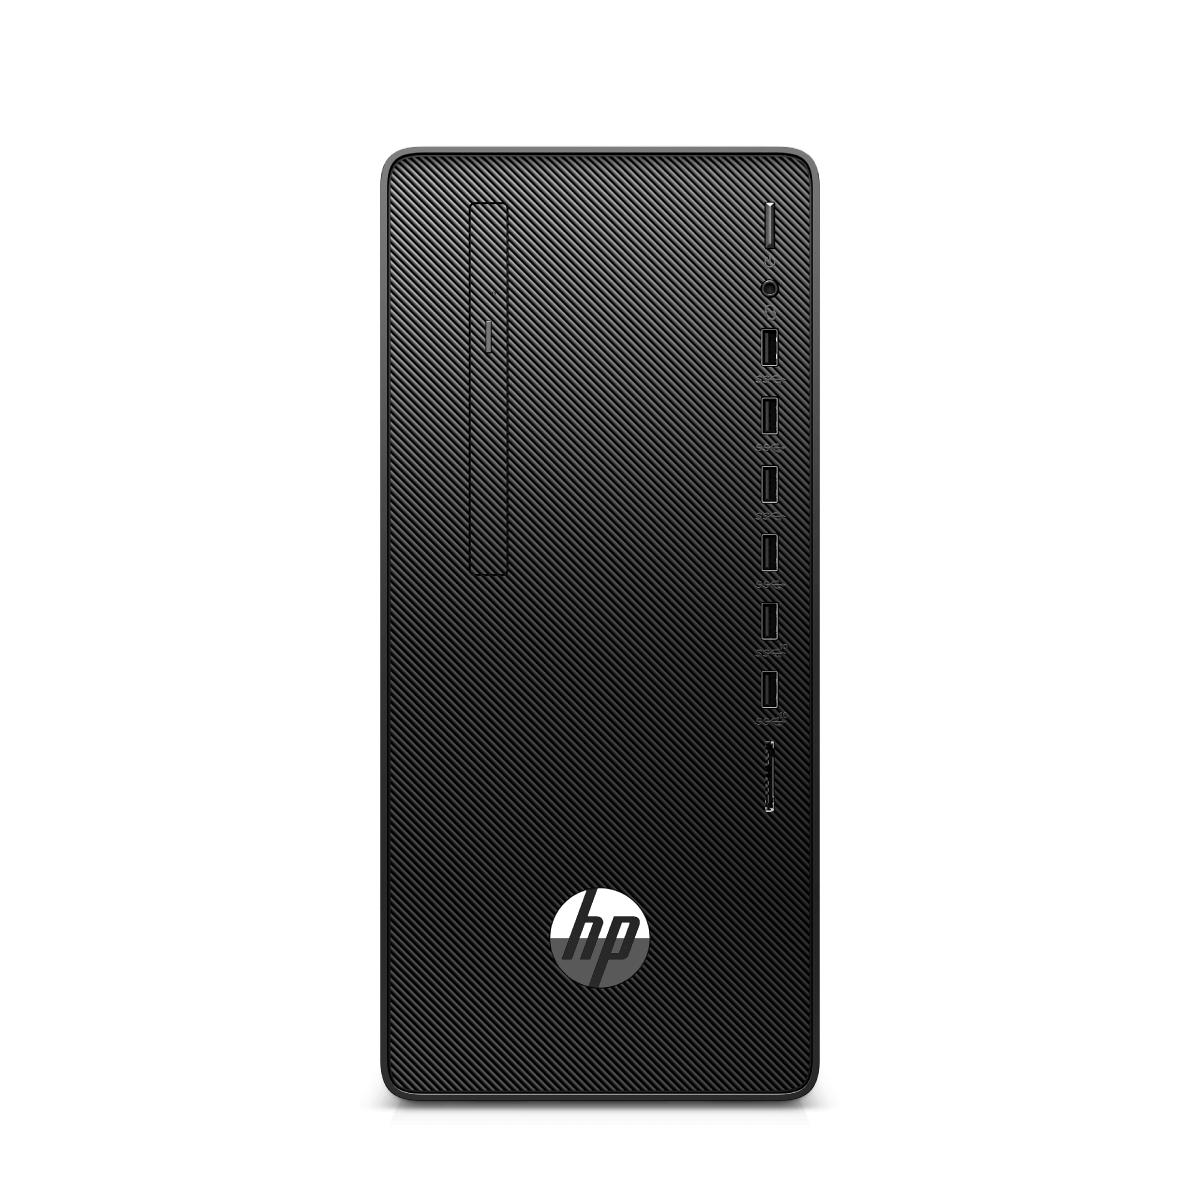 HP 280 Pro G6 Microtower (i7, Black)